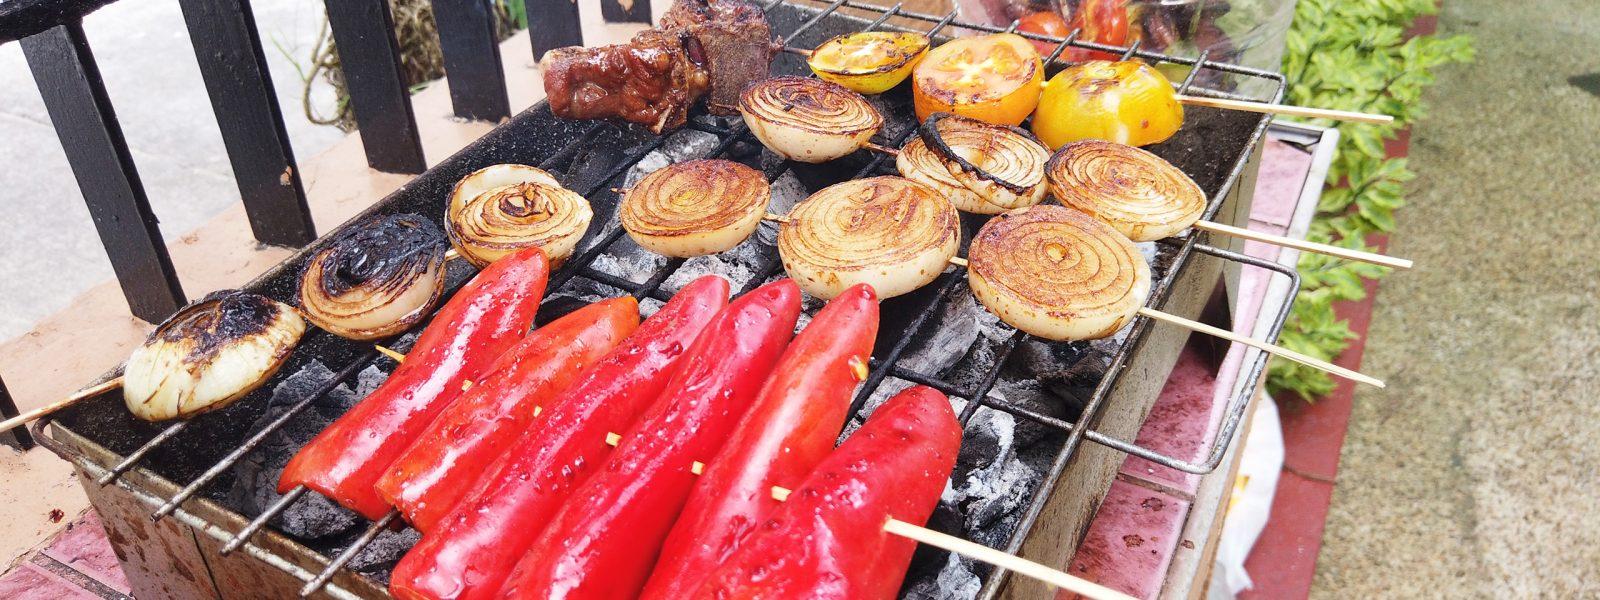 Barbecue Chicken and Pork